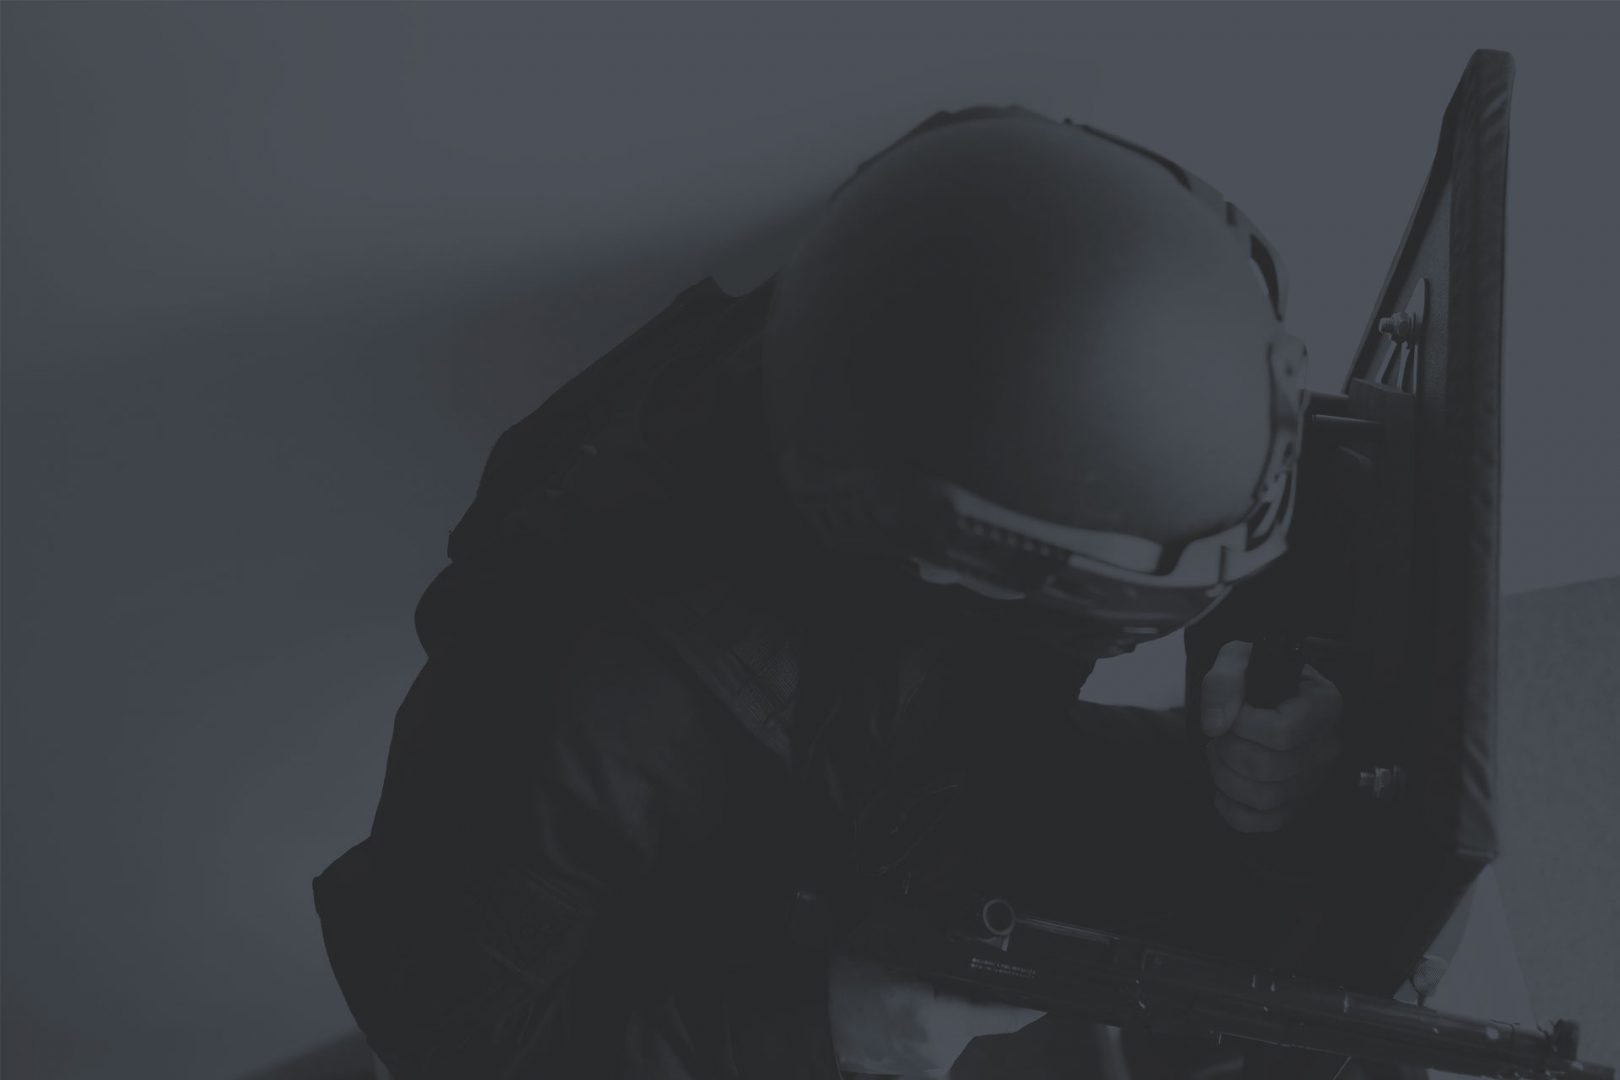 Holding A Ballistic Shield Dark Duotone